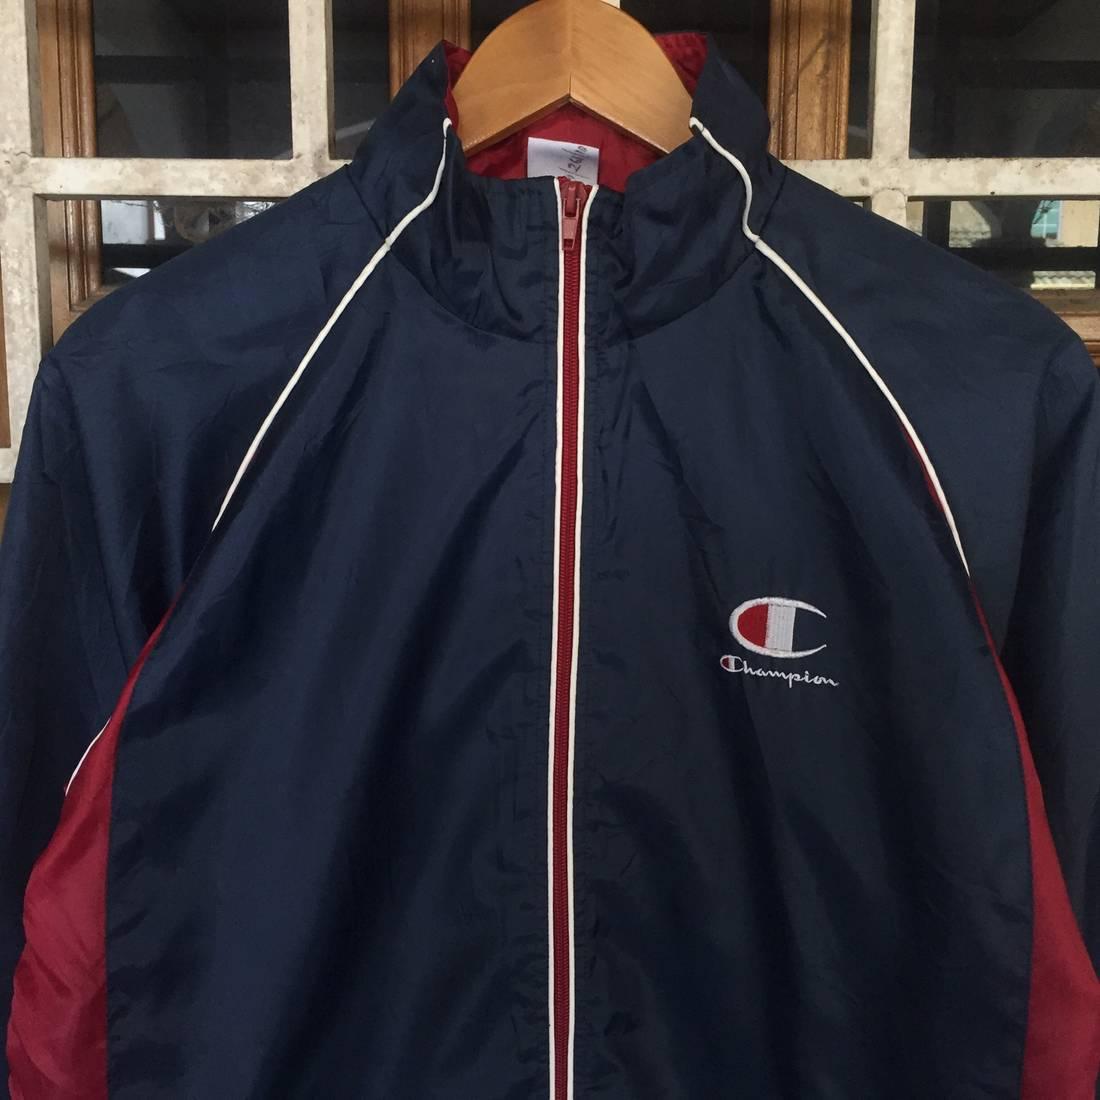 Sale!! CHAMPION Jacket Windbreaker Full Zipper Excellent Condition Medium Size